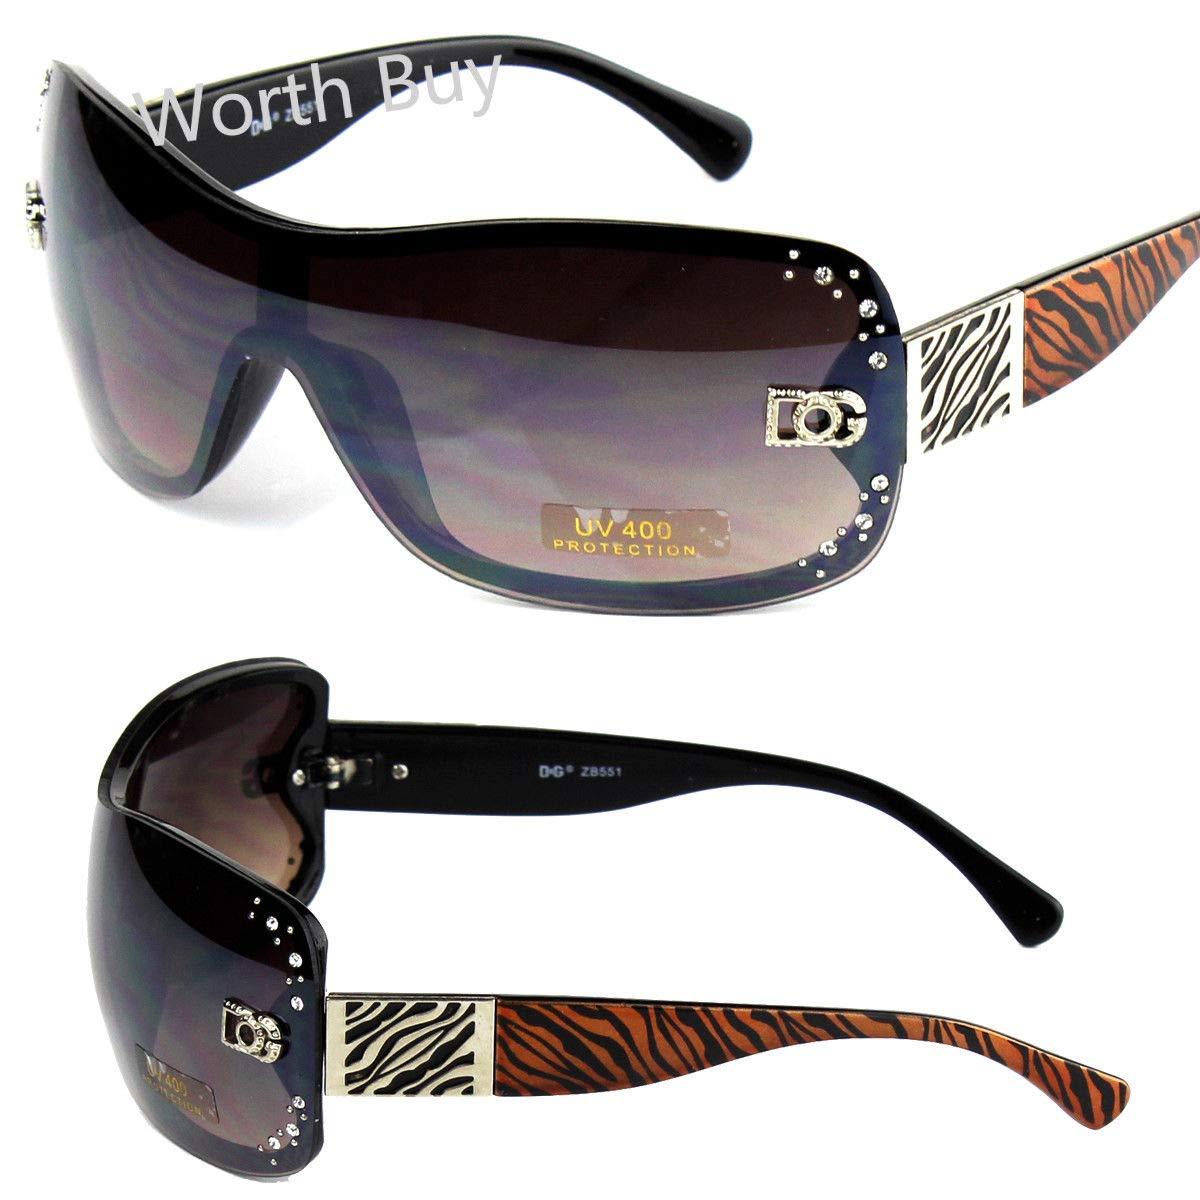 540e5c4276 Amazon.com  DG Womens Rhinestones Zebra Print Sunglasses Designer Shades  Fashion Shield Wrap  Clothing